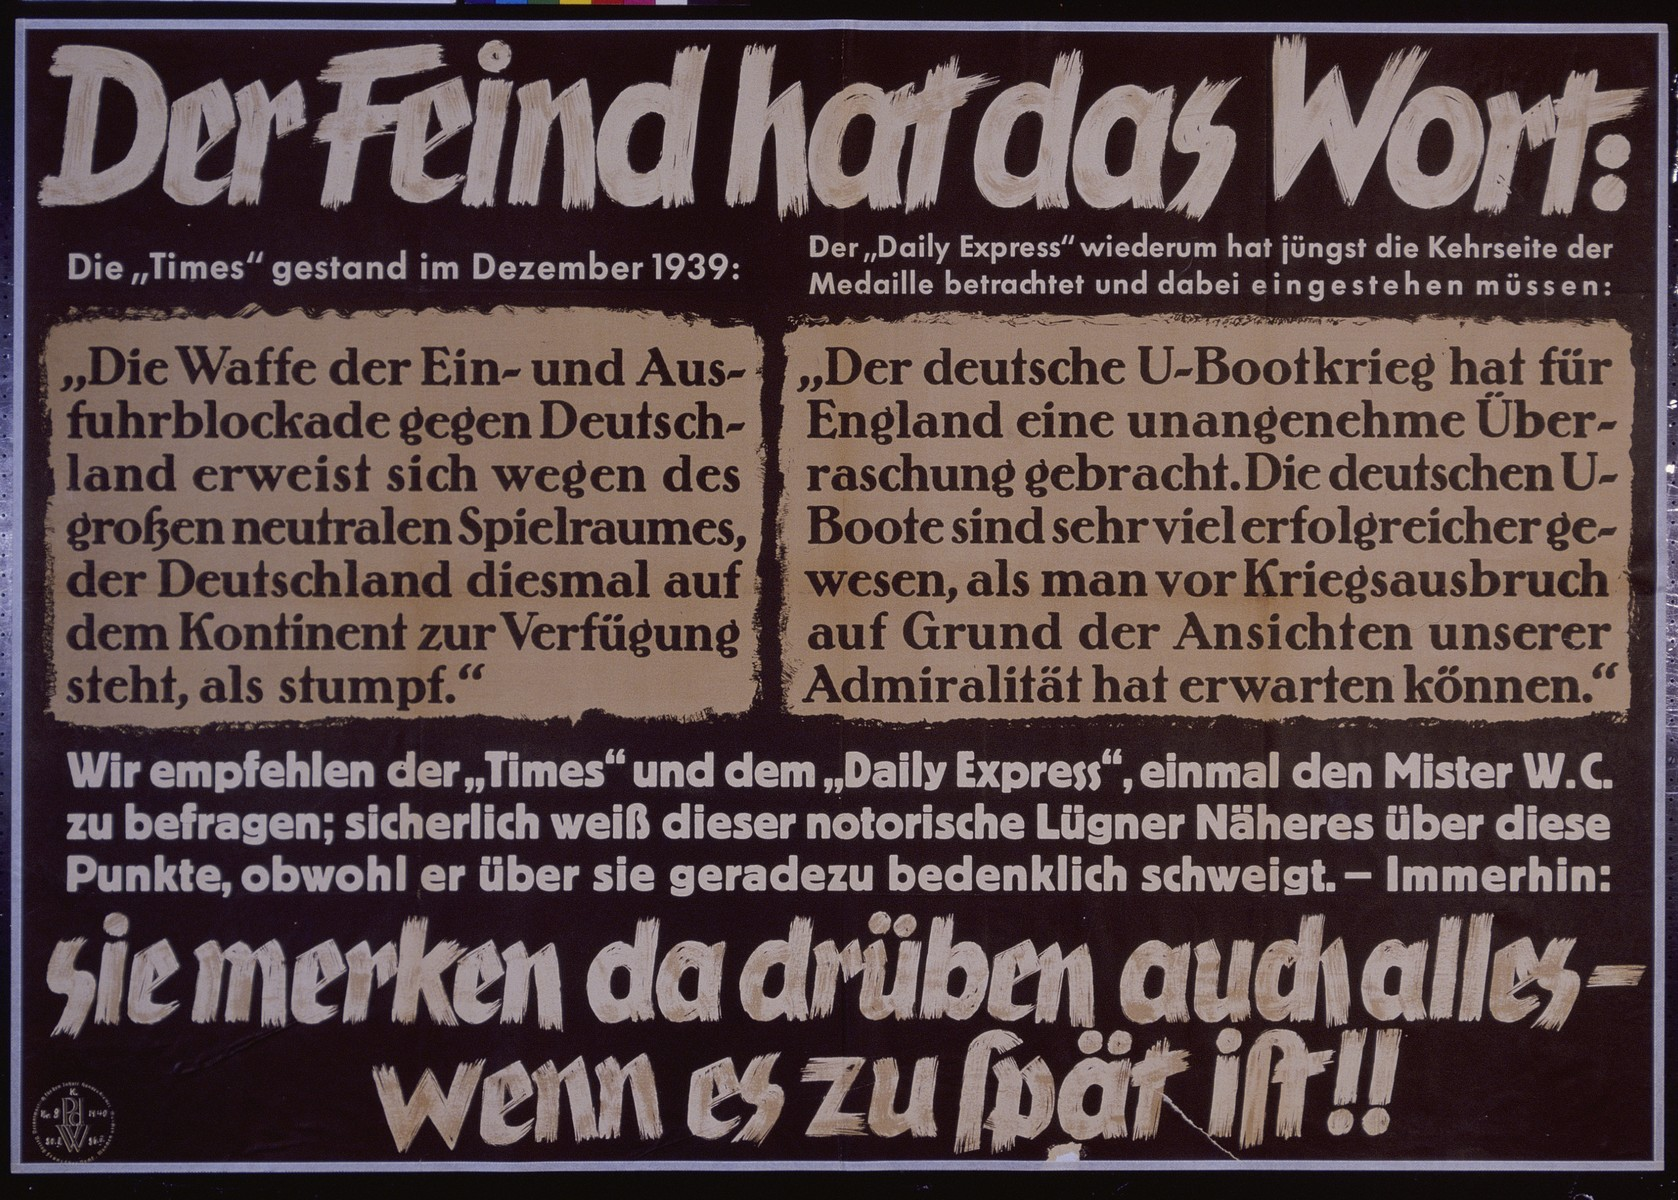 "Nazi propaganda poster entitled, ""Der Feind hat das Wort,"" issued by the ""Parole der Woche,"" a wall newspaper (Wandzeitung) published by the National Socialist Party propaganda office in Munich."